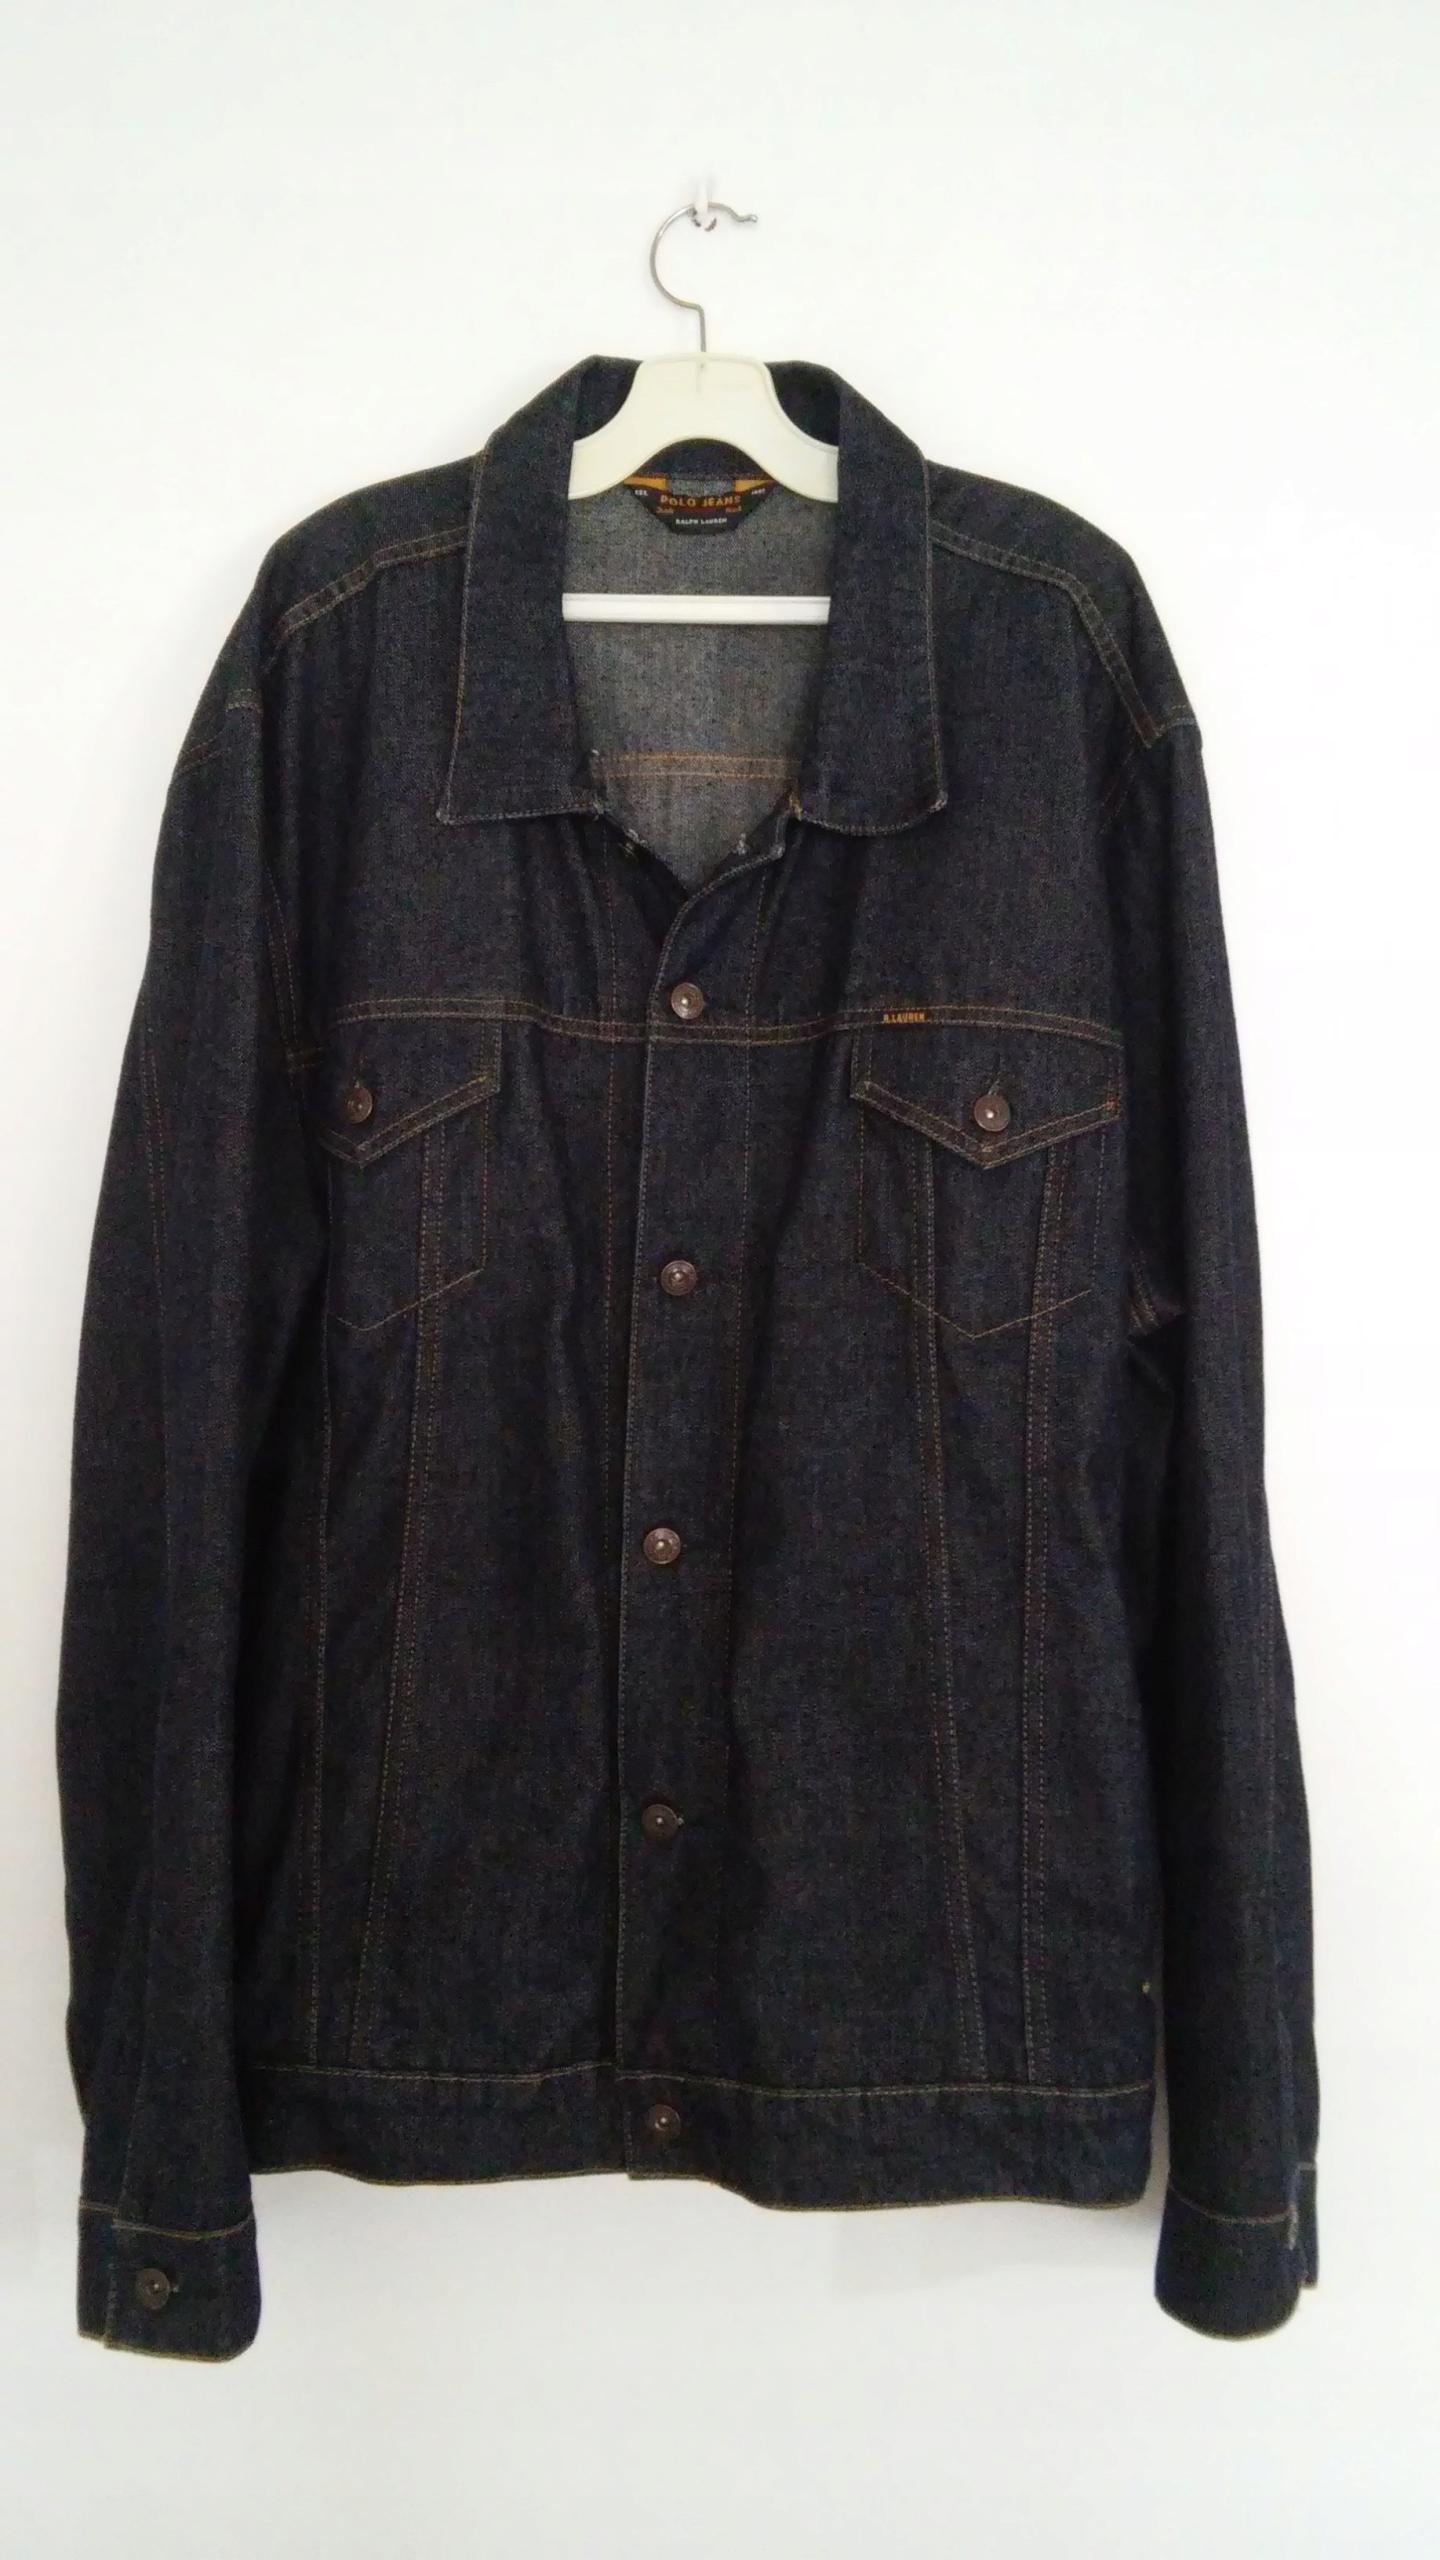 Ralph Lauren - kurtka jeansowa, katana - jak NOWA